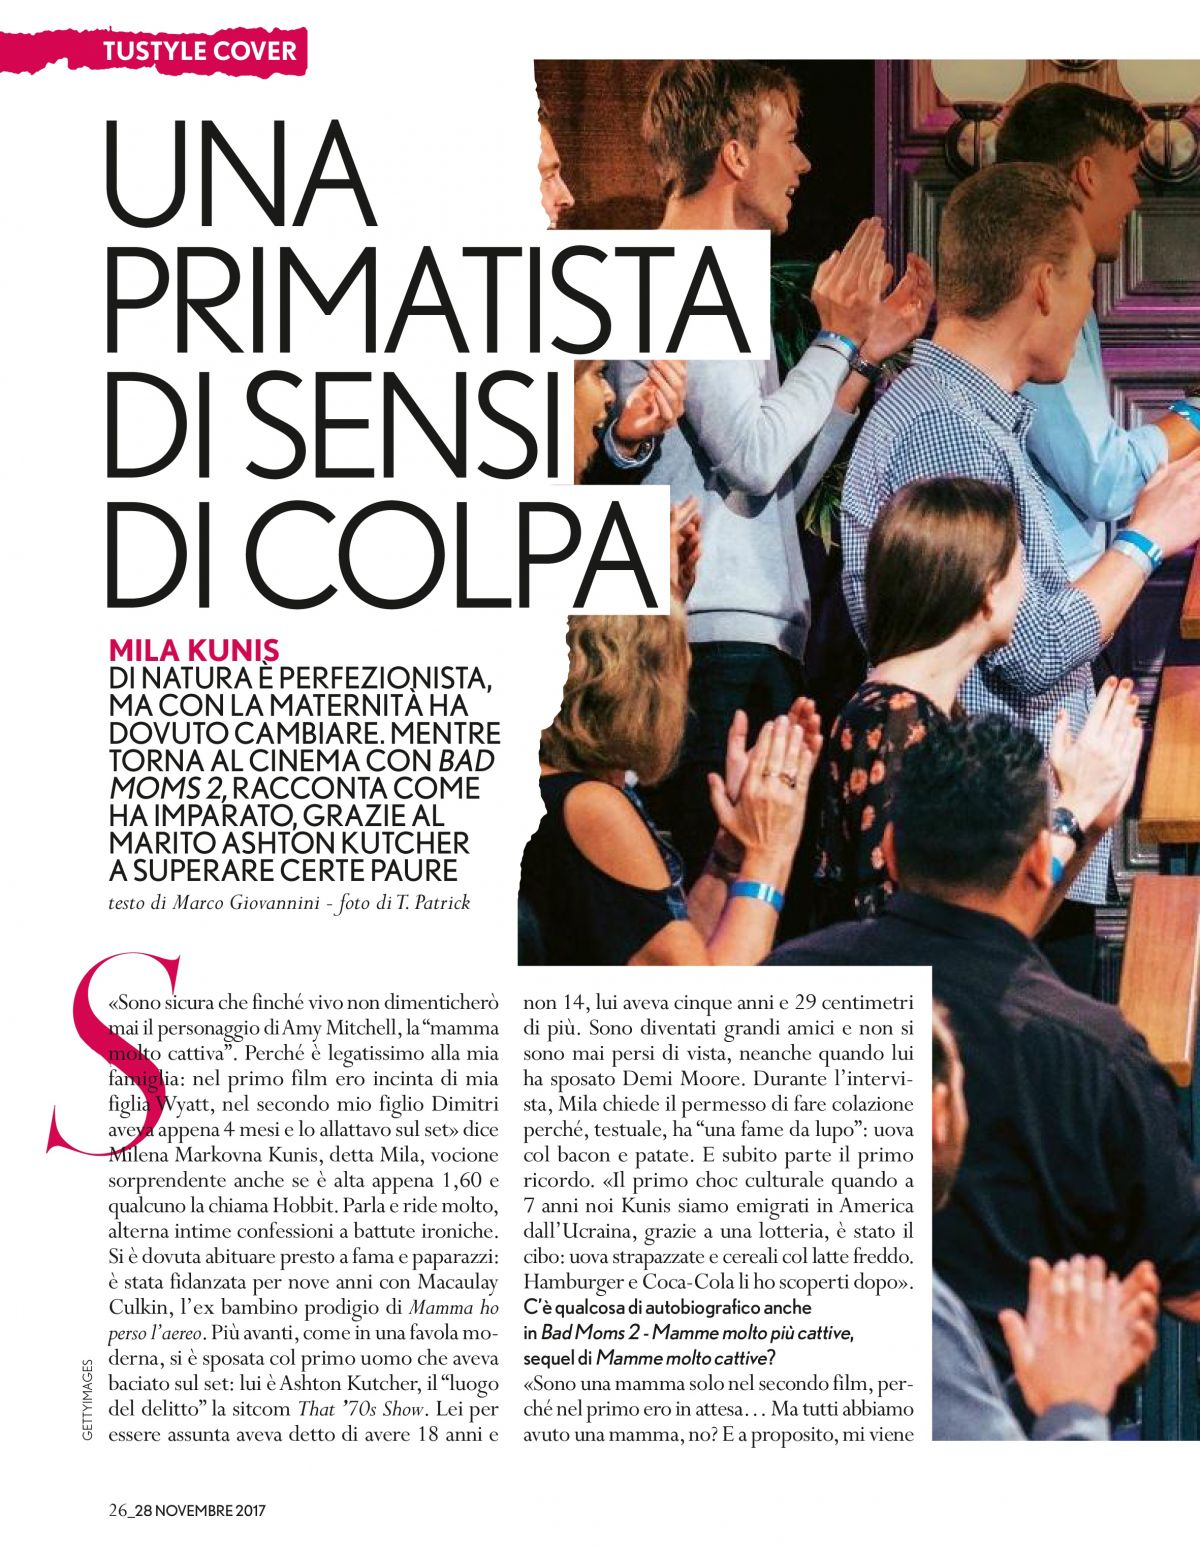 Tustyle Magazine November 2015 Issue: MILA KUNIS In Tu Style Magazine, November 2017